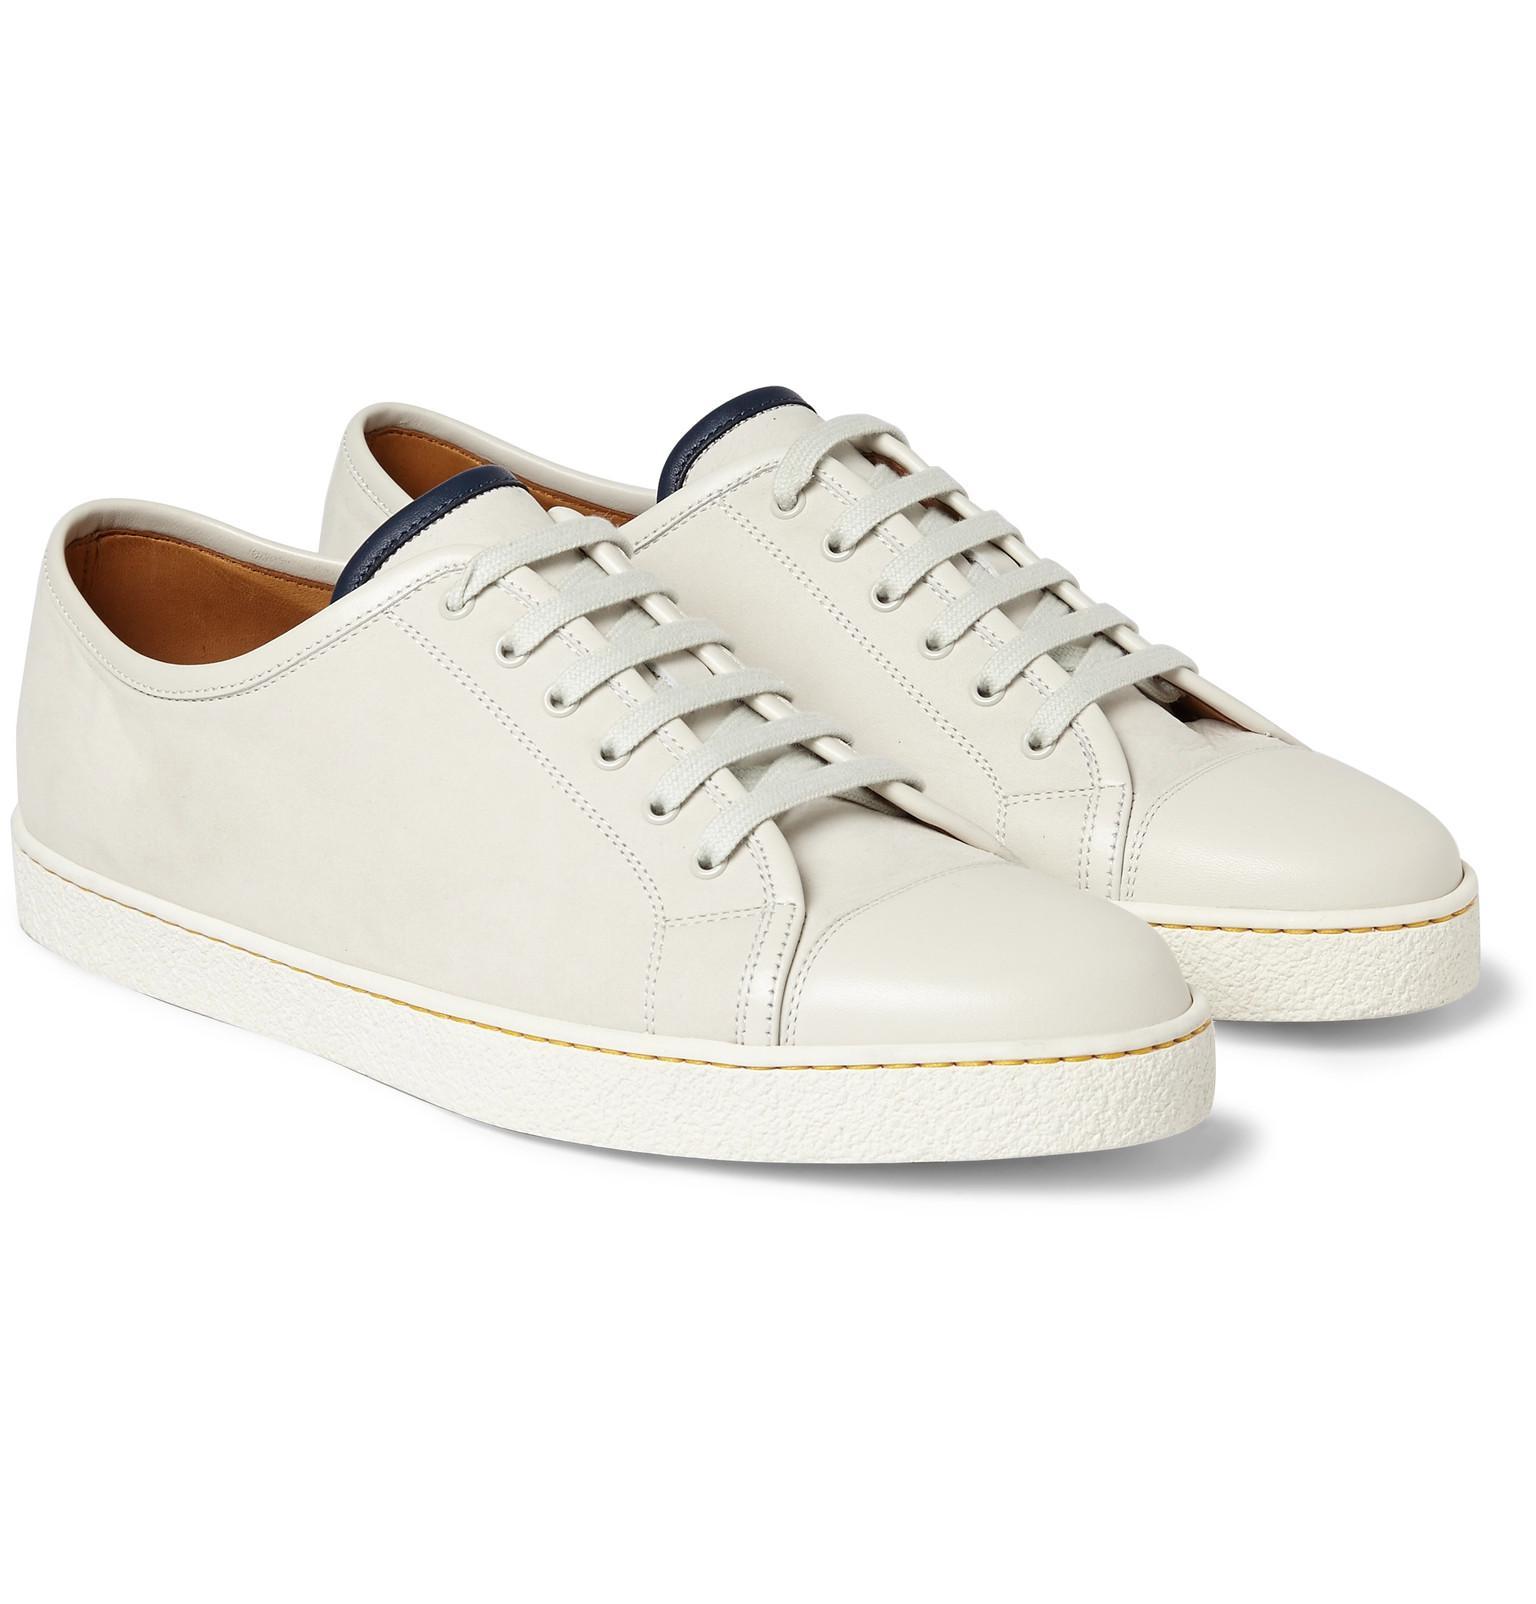 discount low cost buy cheap ebay John Lobb Levah Cap-Toe Brushed-Leather Sneakers kAQSqkd